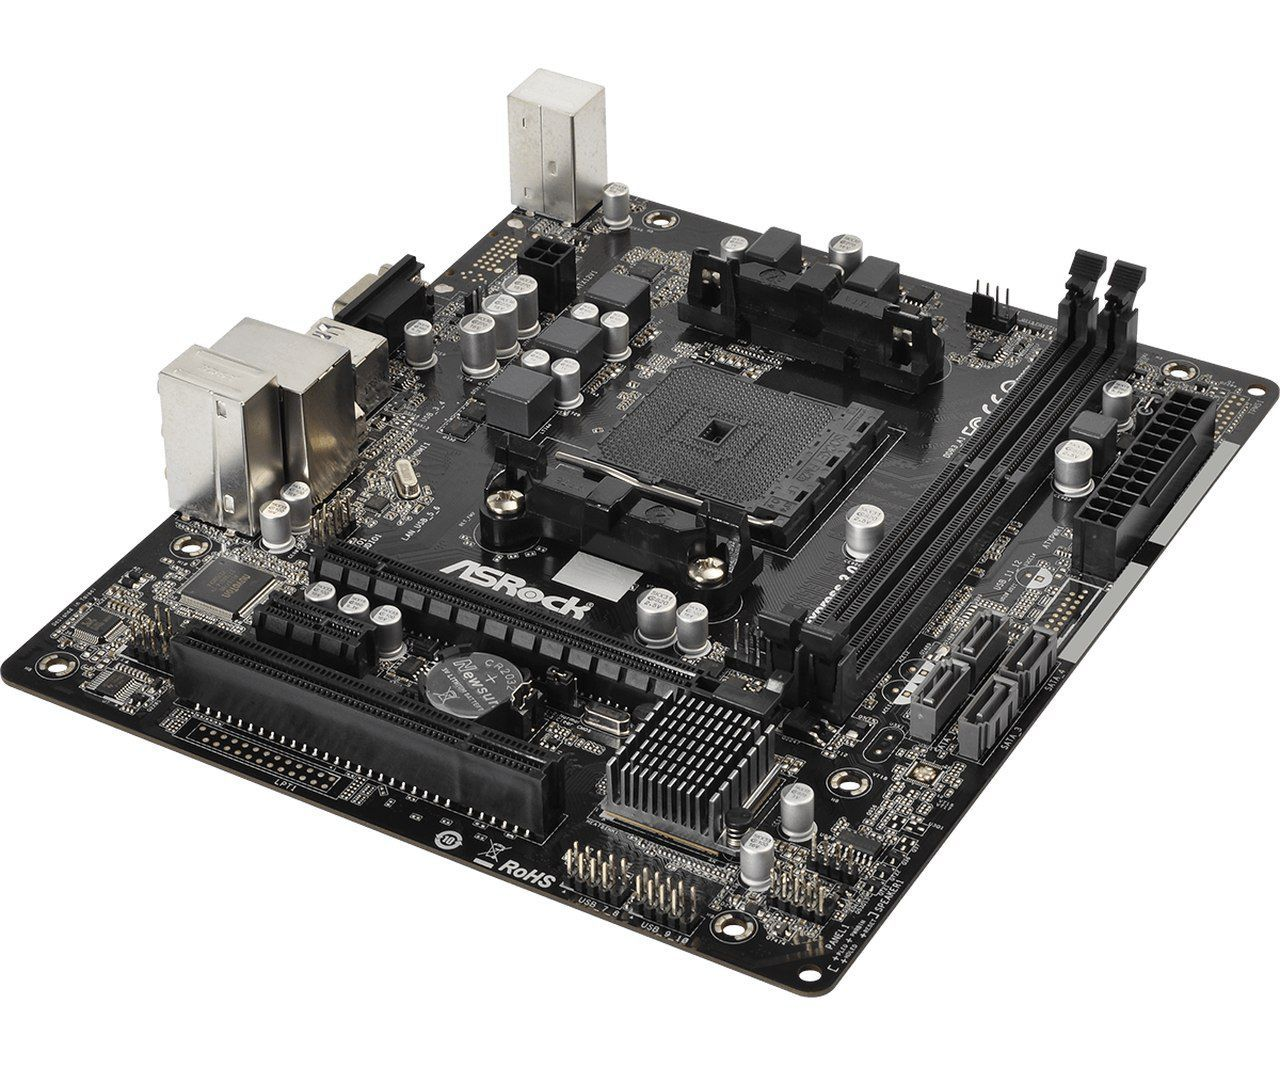 Kit Upgrade Processador AMD A4 6300 + Placa Mãe FM2A68M HD